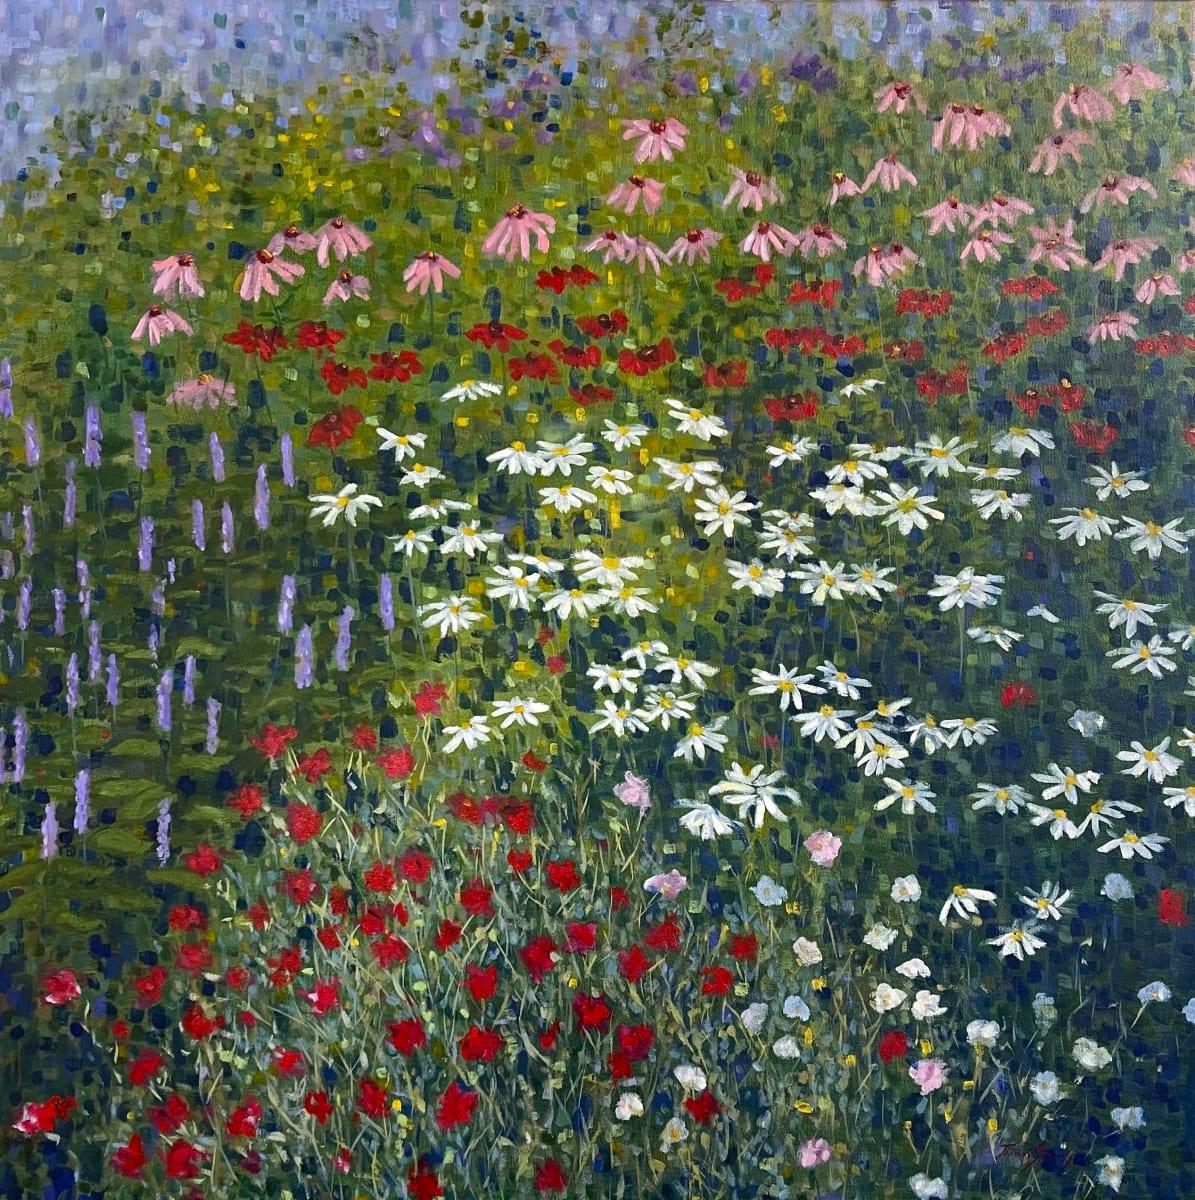 King Street Pollinator Garden  36.07546N 79.09972W by Thomas Stevens